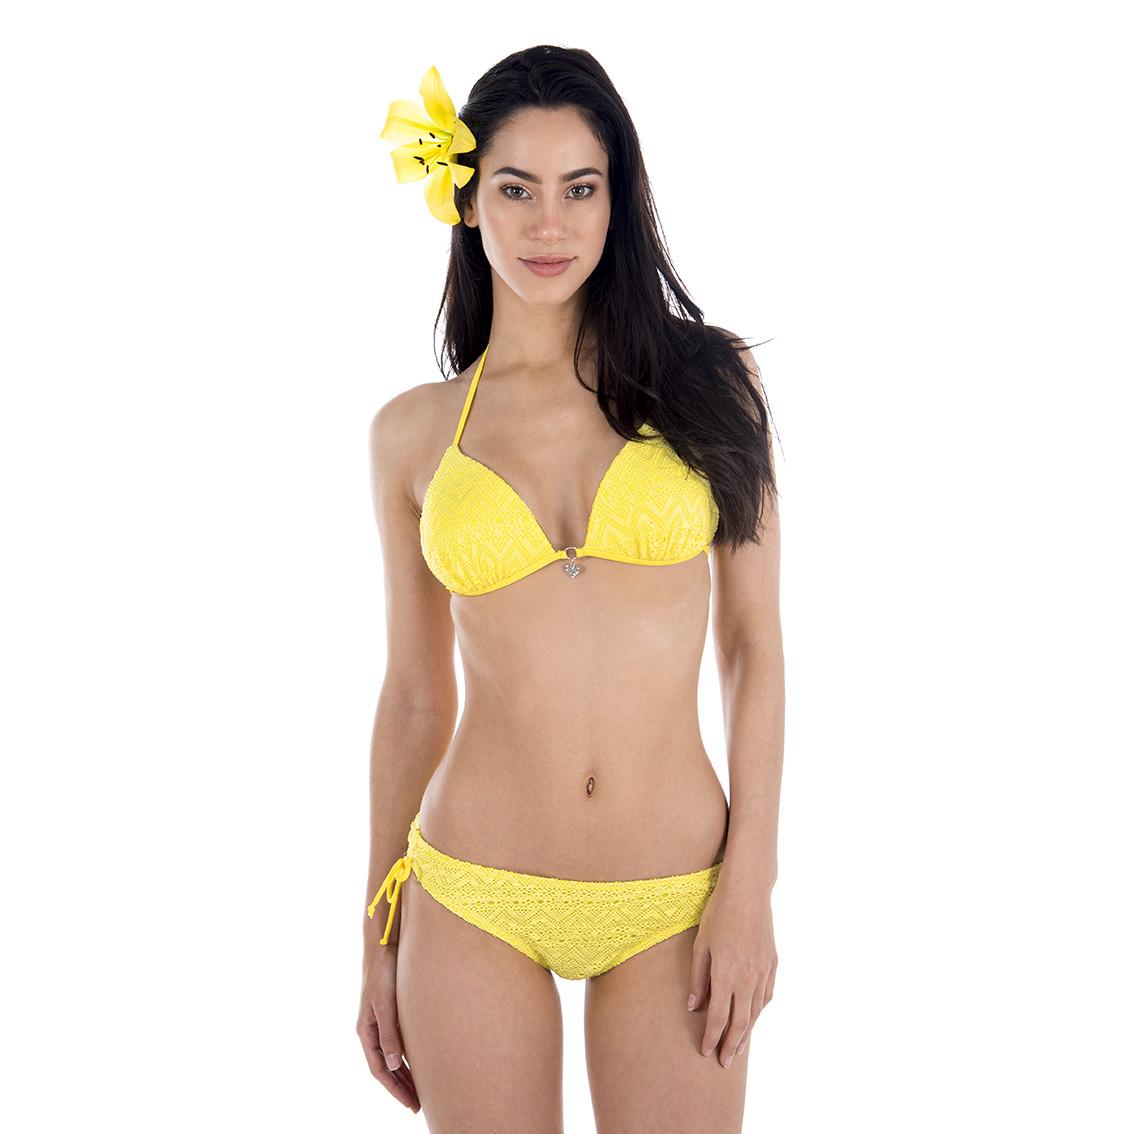 Maillot de bain femme miss freegun 2 pièces jaune (photo)